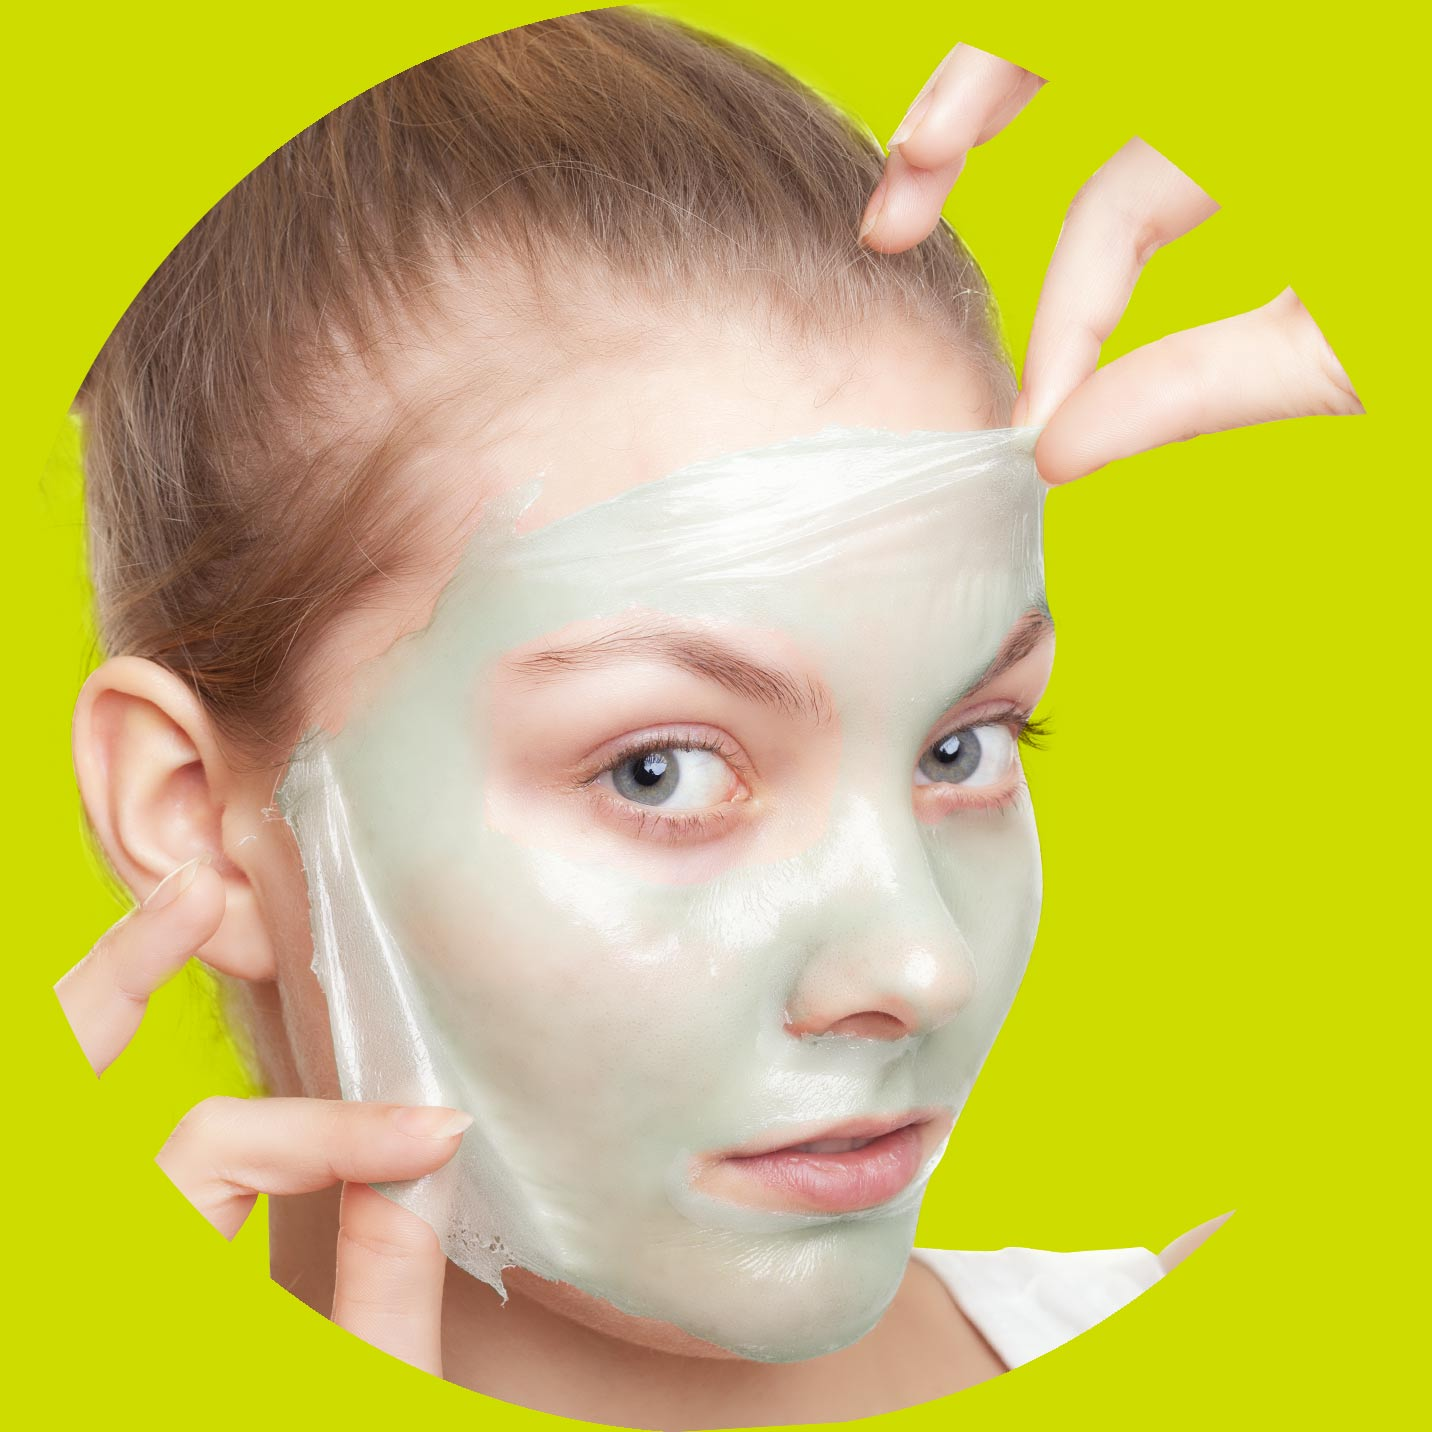 ماسک پیل آف خیار فریمن مدل Feeling Beautiful حجم 175 میل